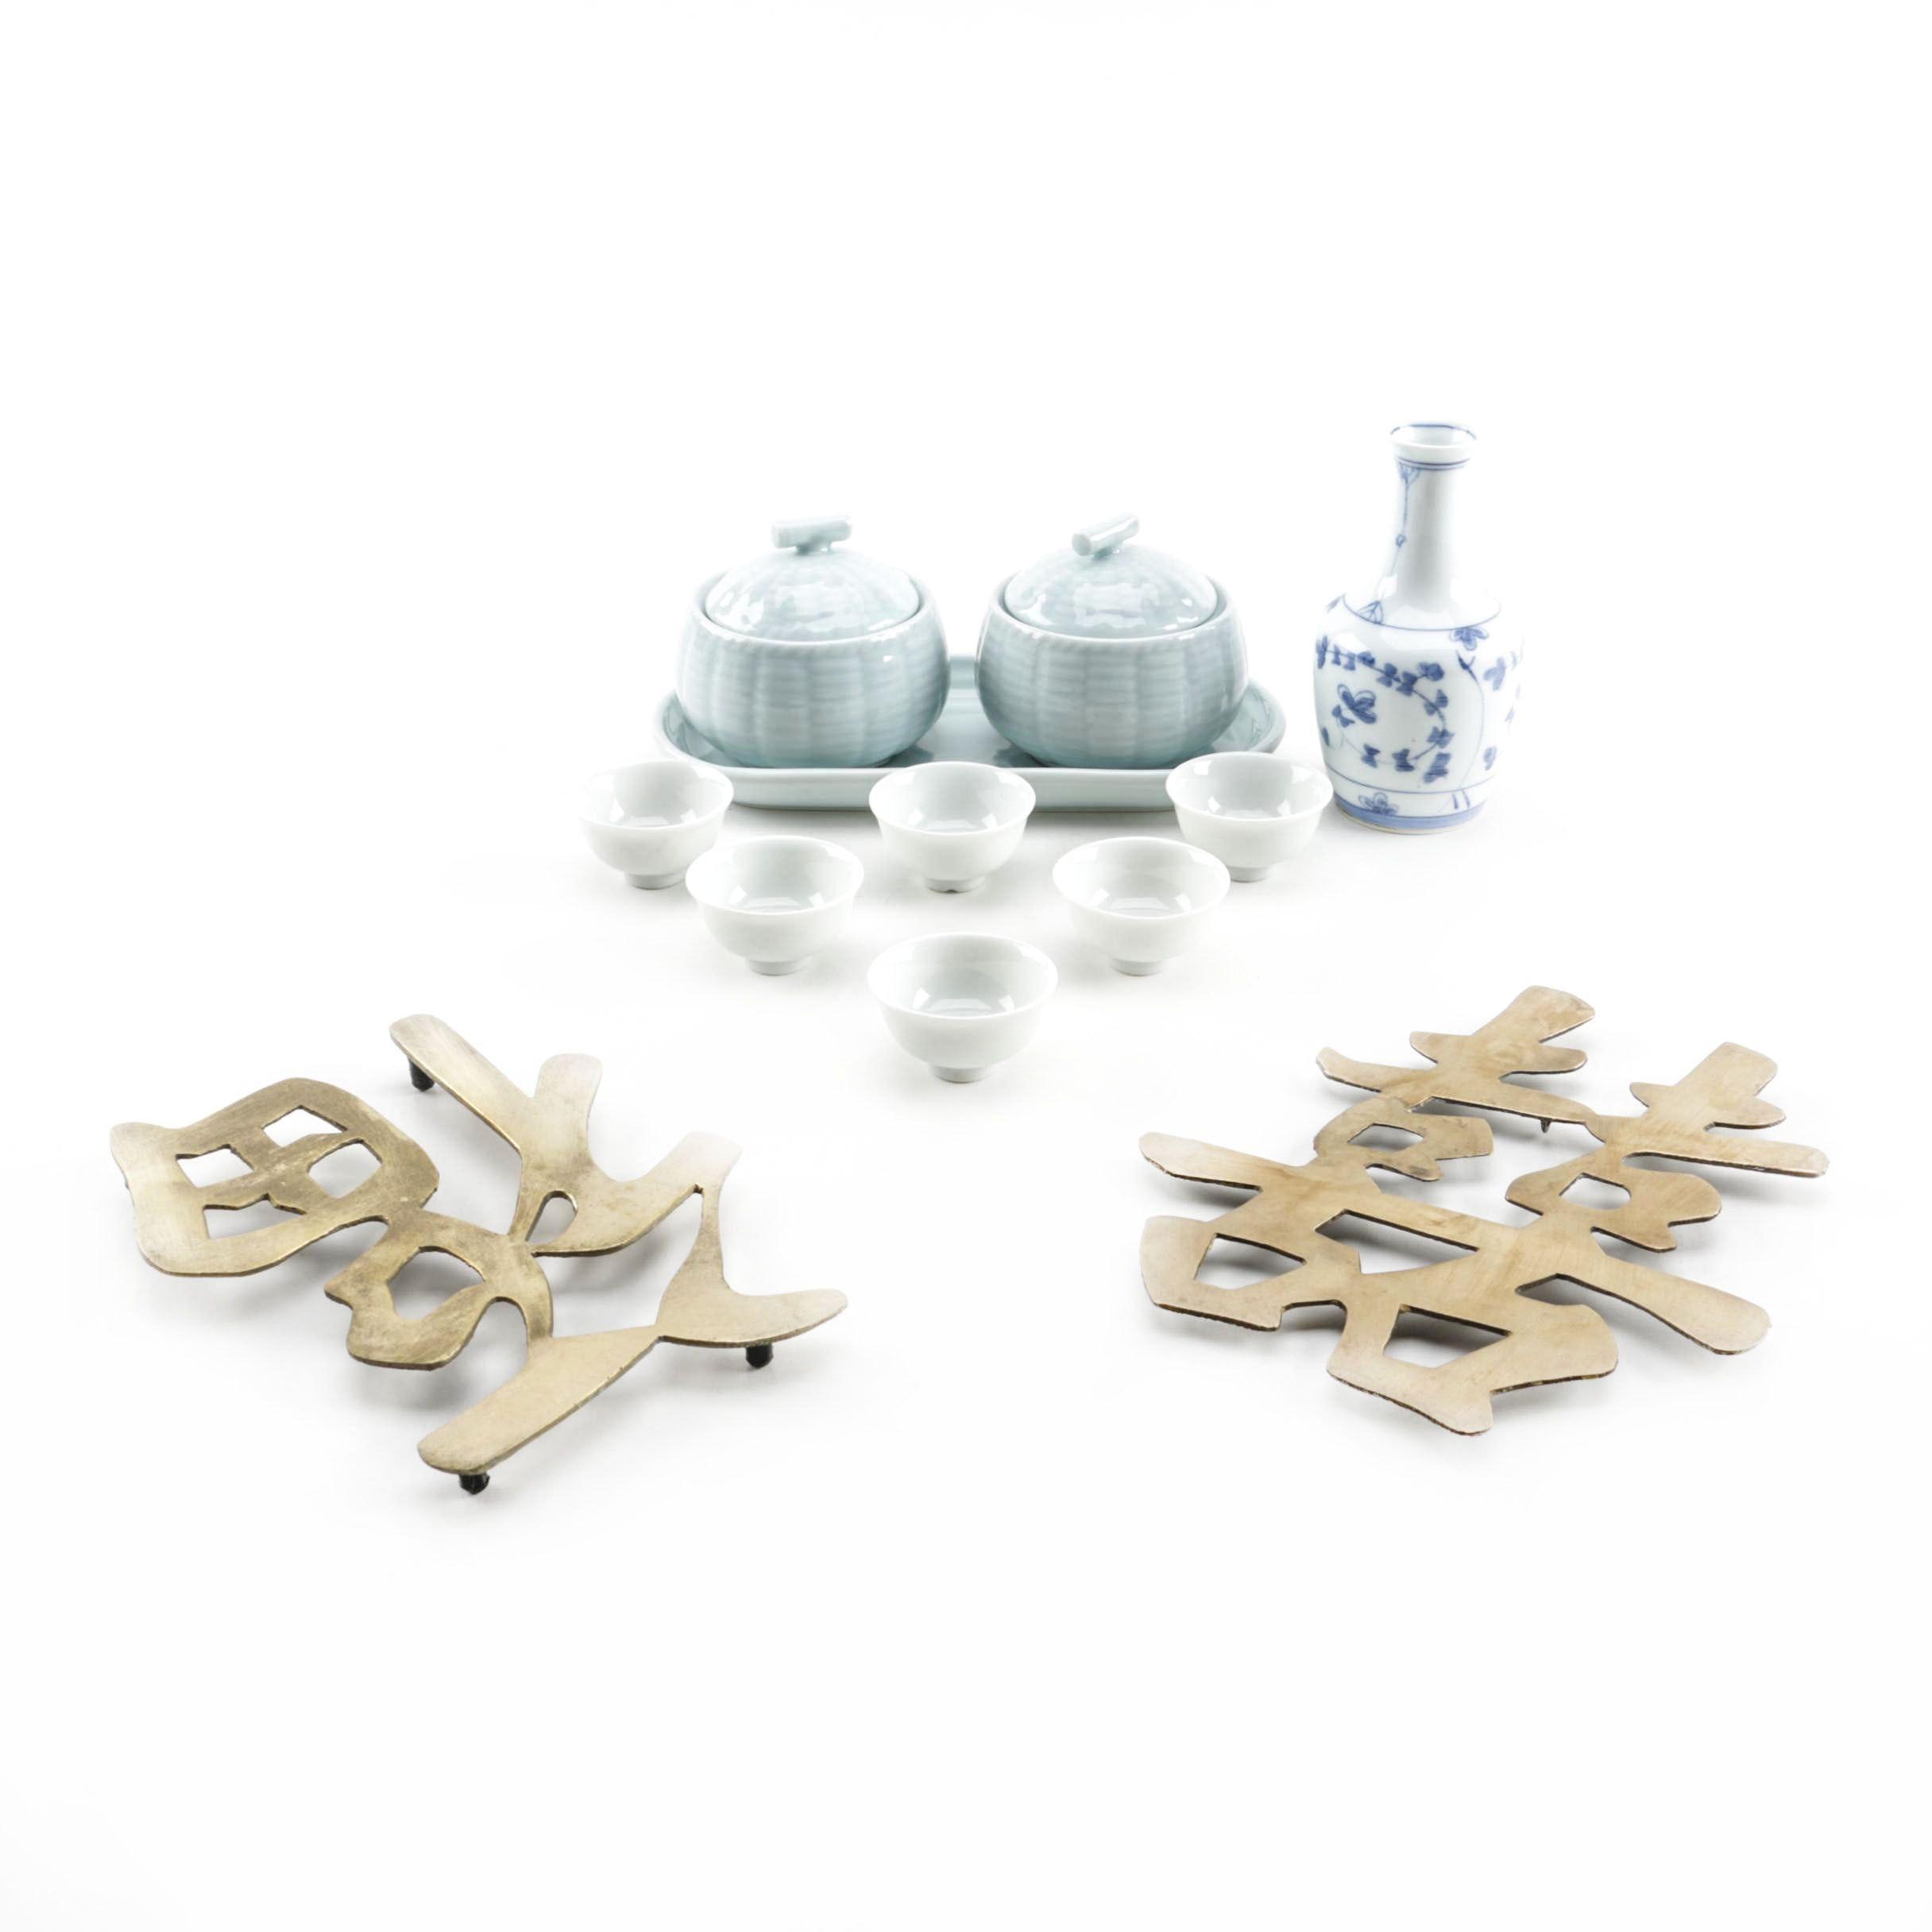 East Asian Tableware Including Japanese Porcelain